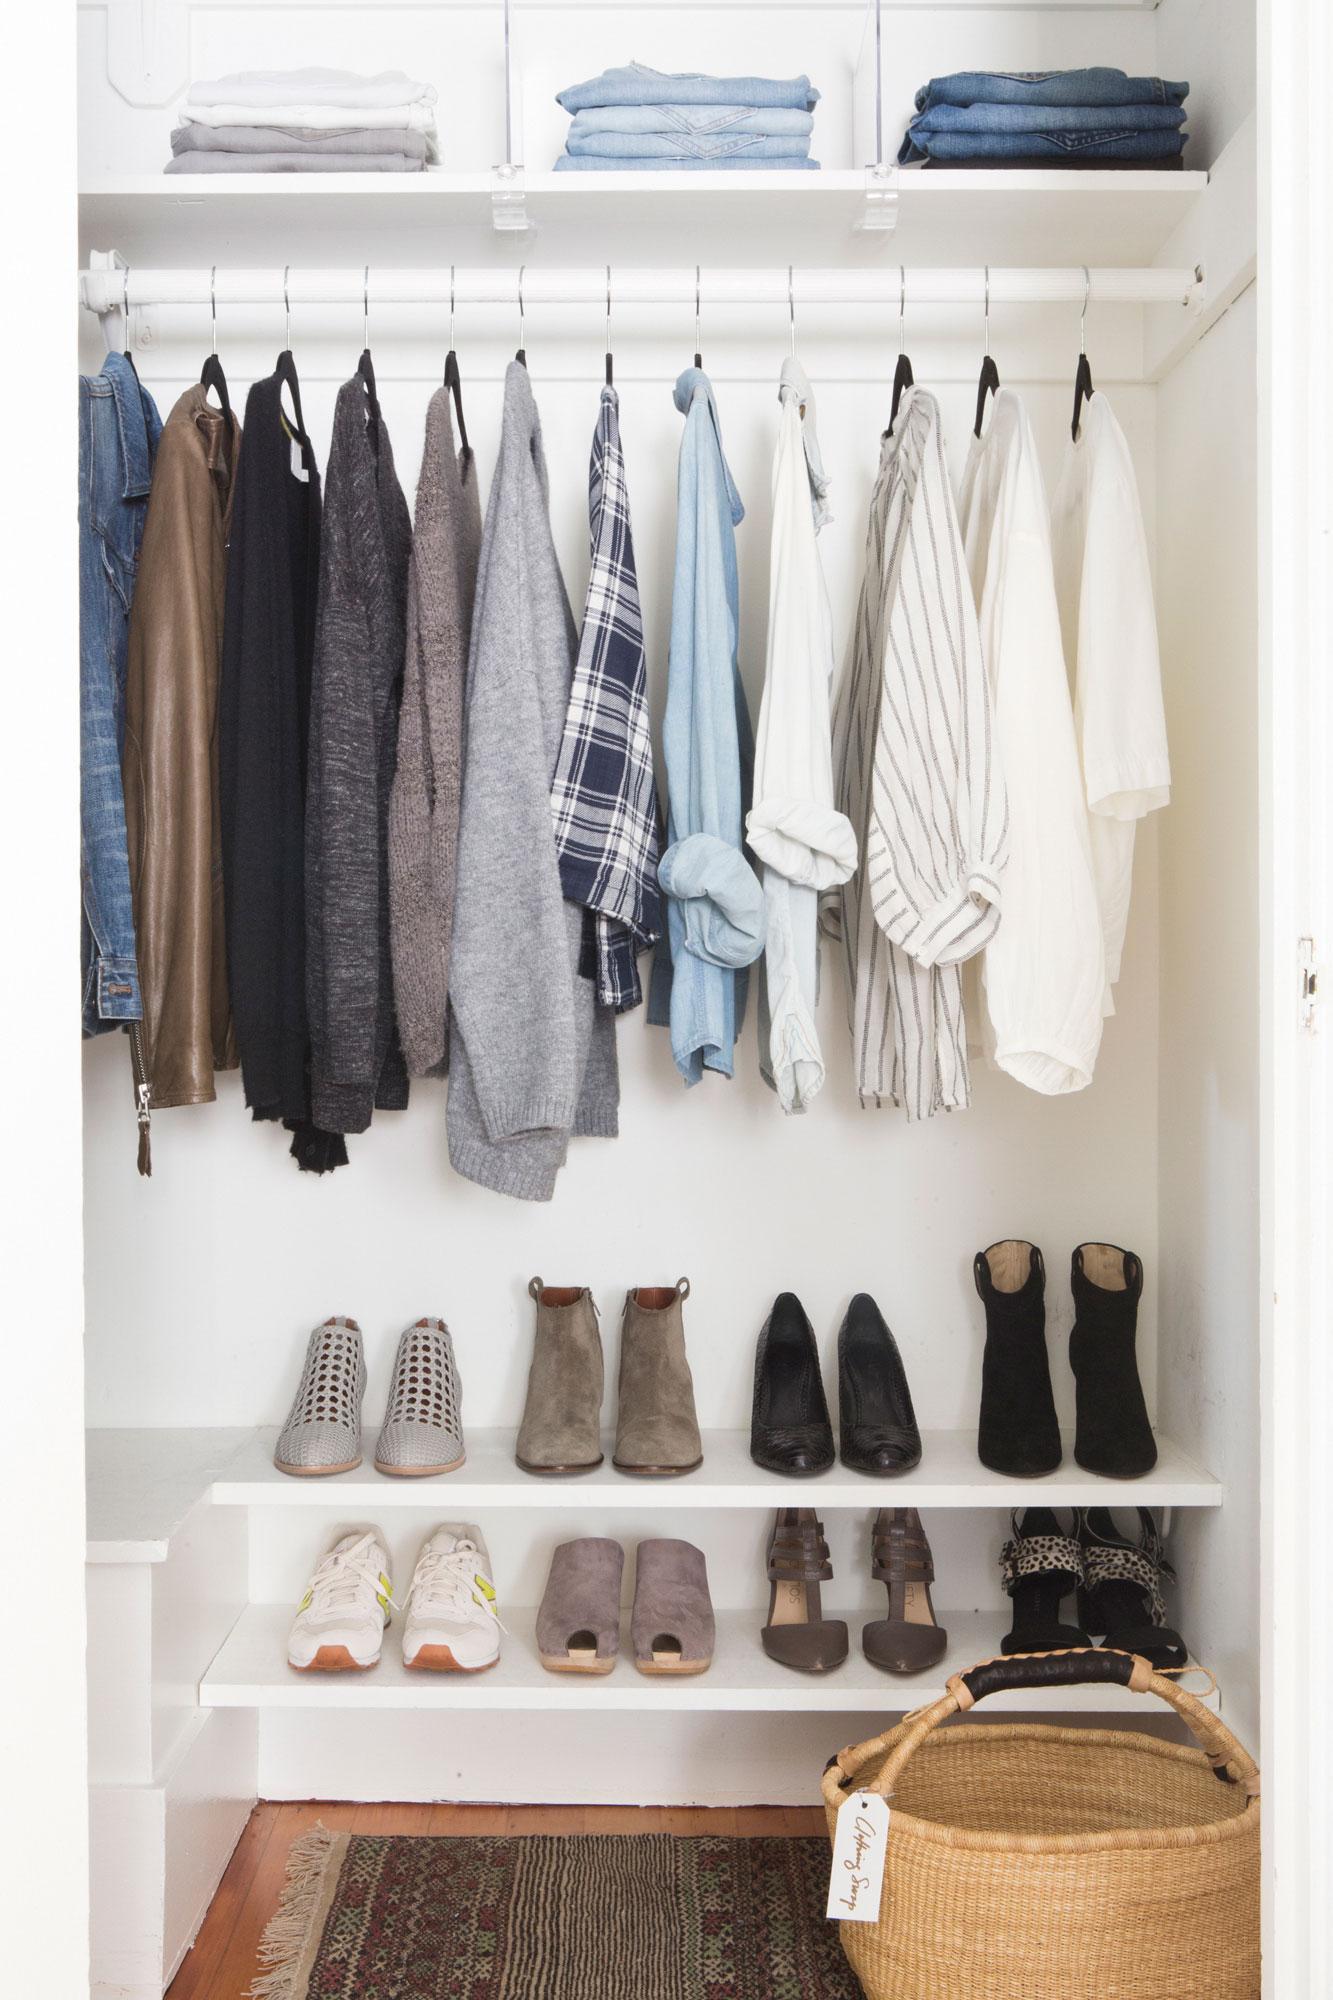 01-02-17-ht-ClosetMakeover-4.jpg